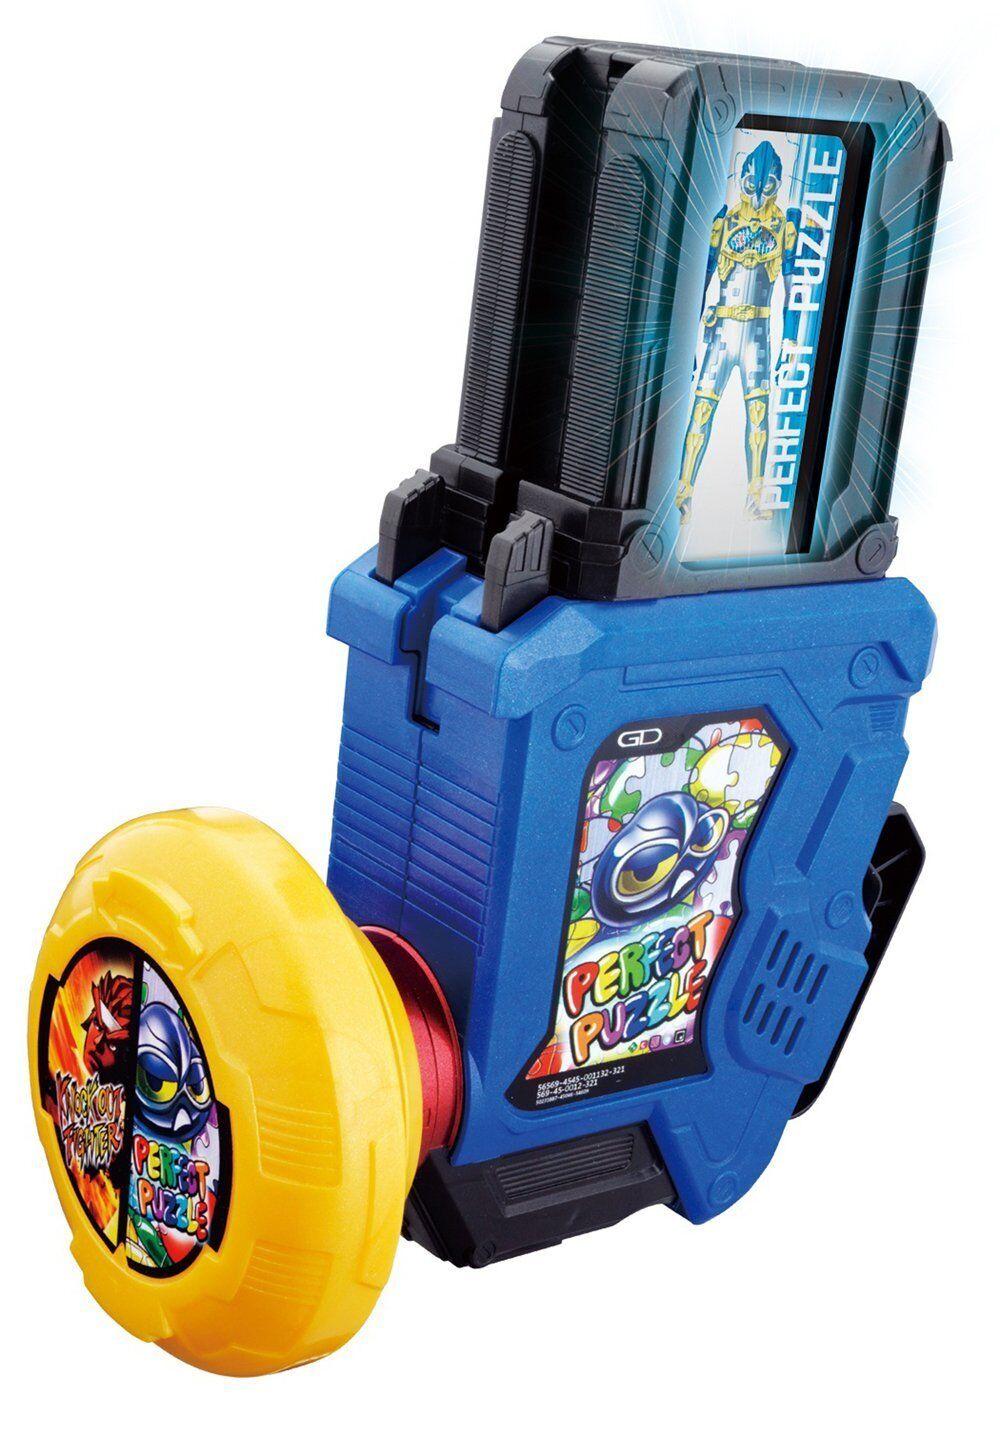 Bandai Kamen Rider EX-AID Makeover Henshin Game DX Gashat Gear Dual